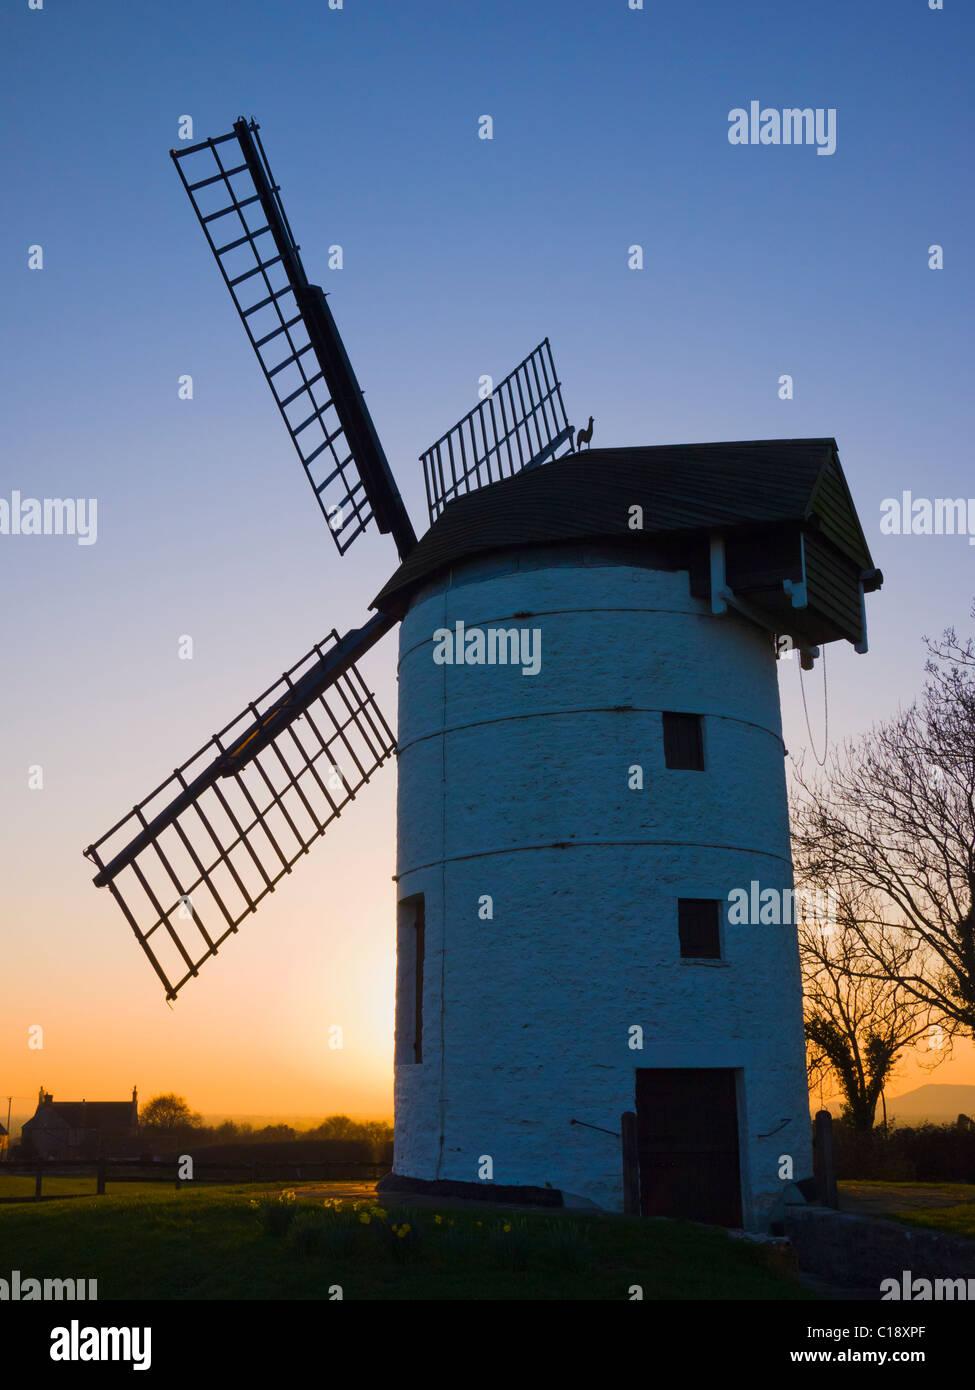 Ashton Windmill at Chapel Allerton, Somerset, England. - Stock Image